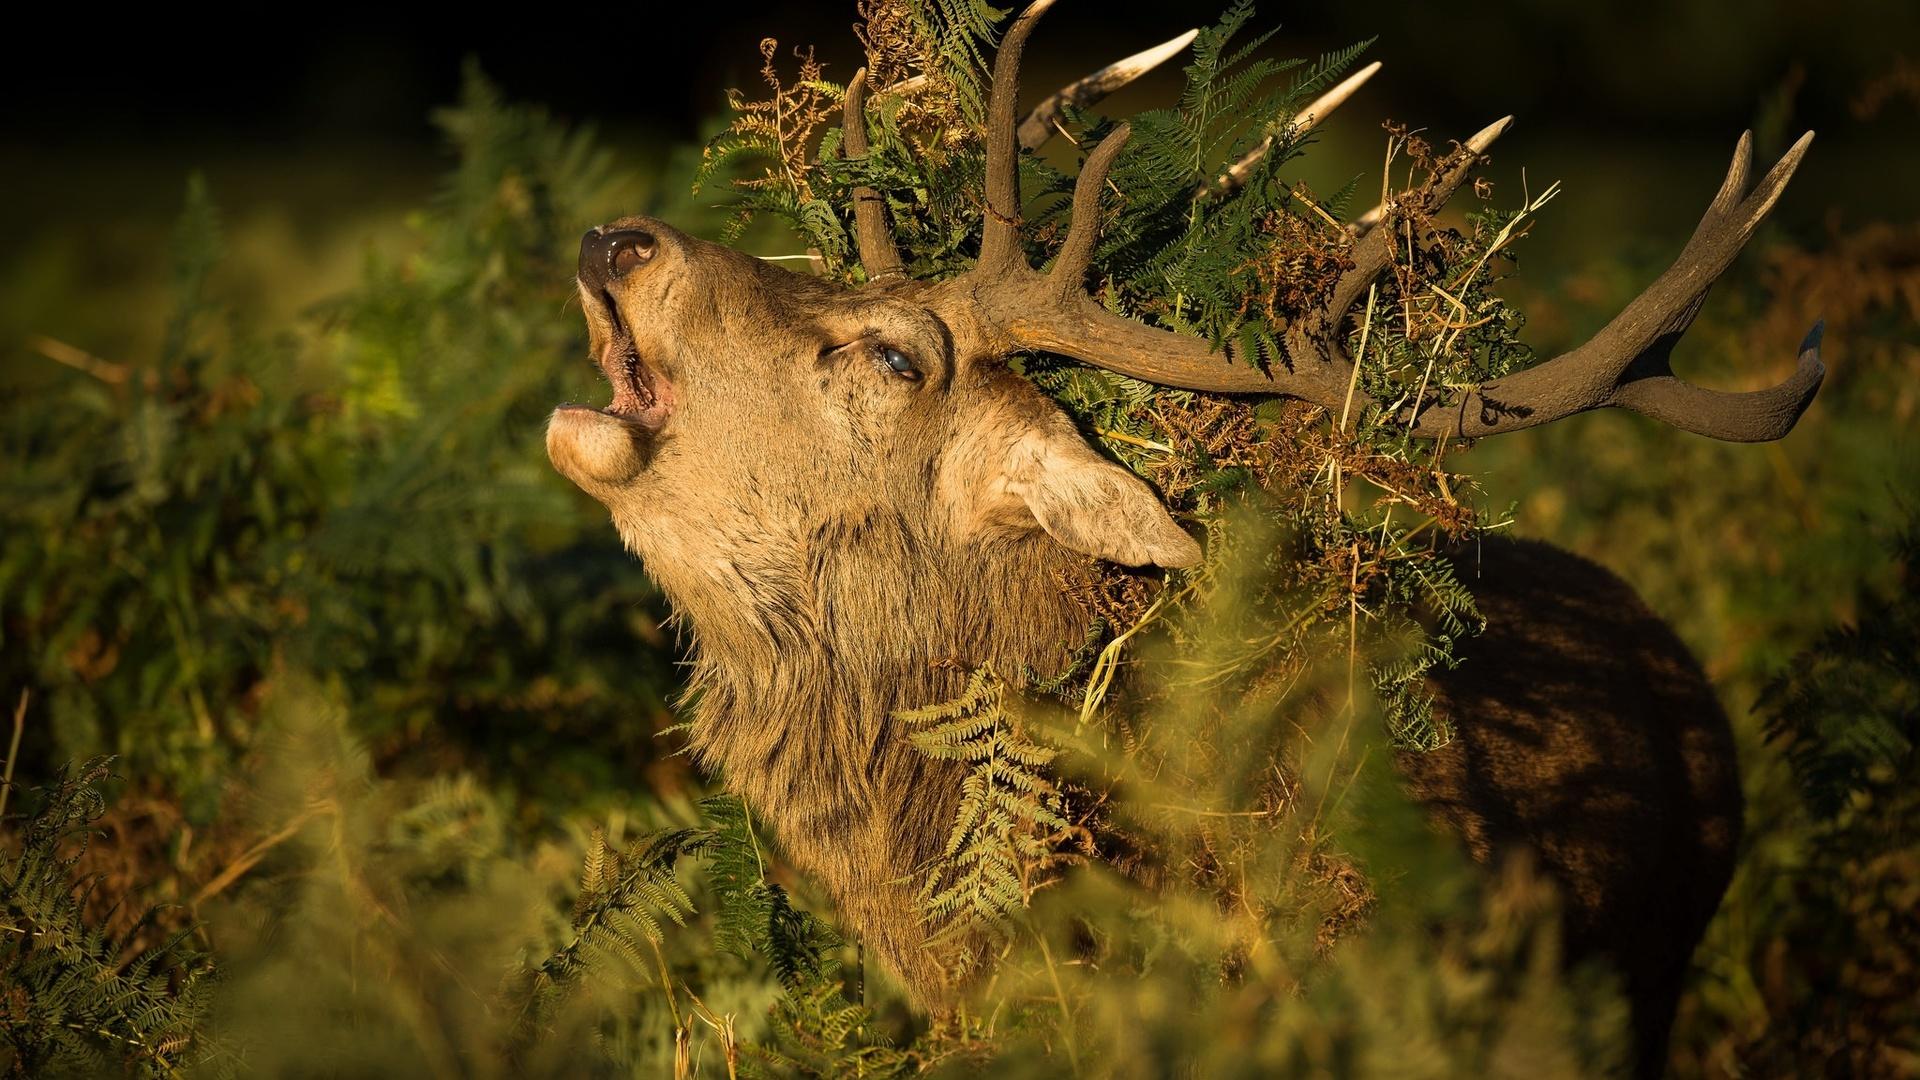 лес, олень, рога, трава